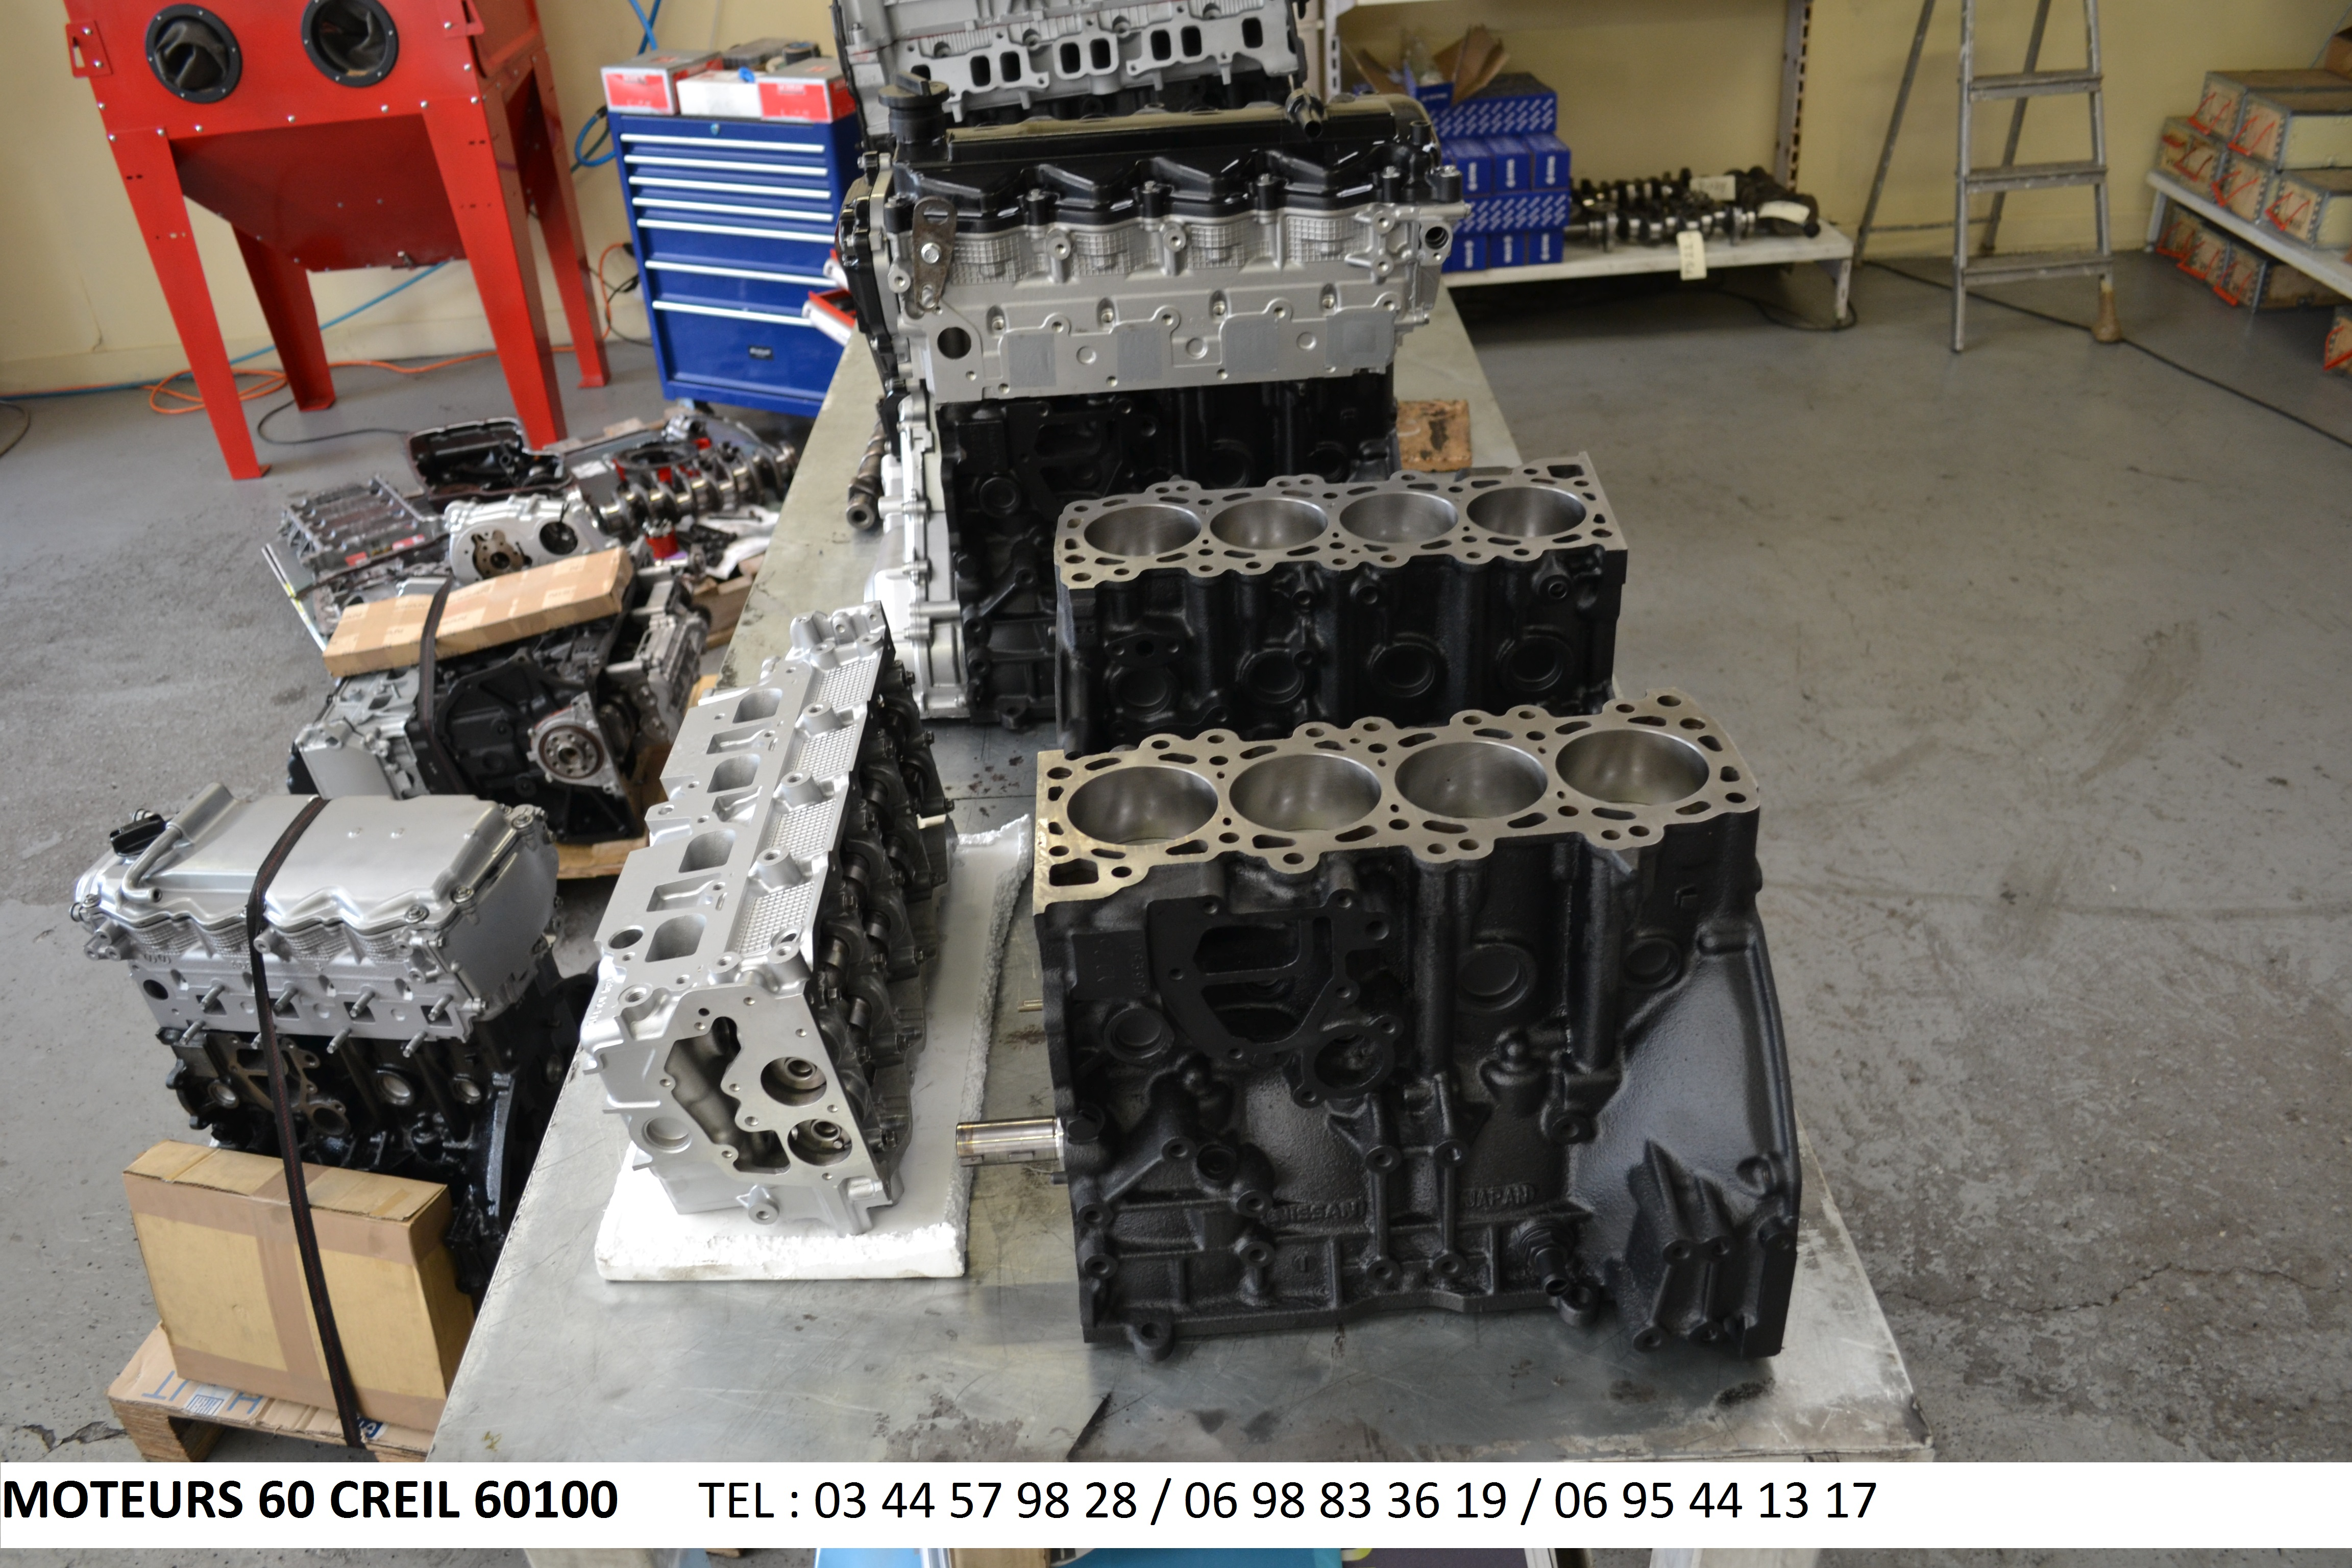 Photo ads/719000/719375/a719375.jpg : moteur nissan pathfinder navara maxity d40